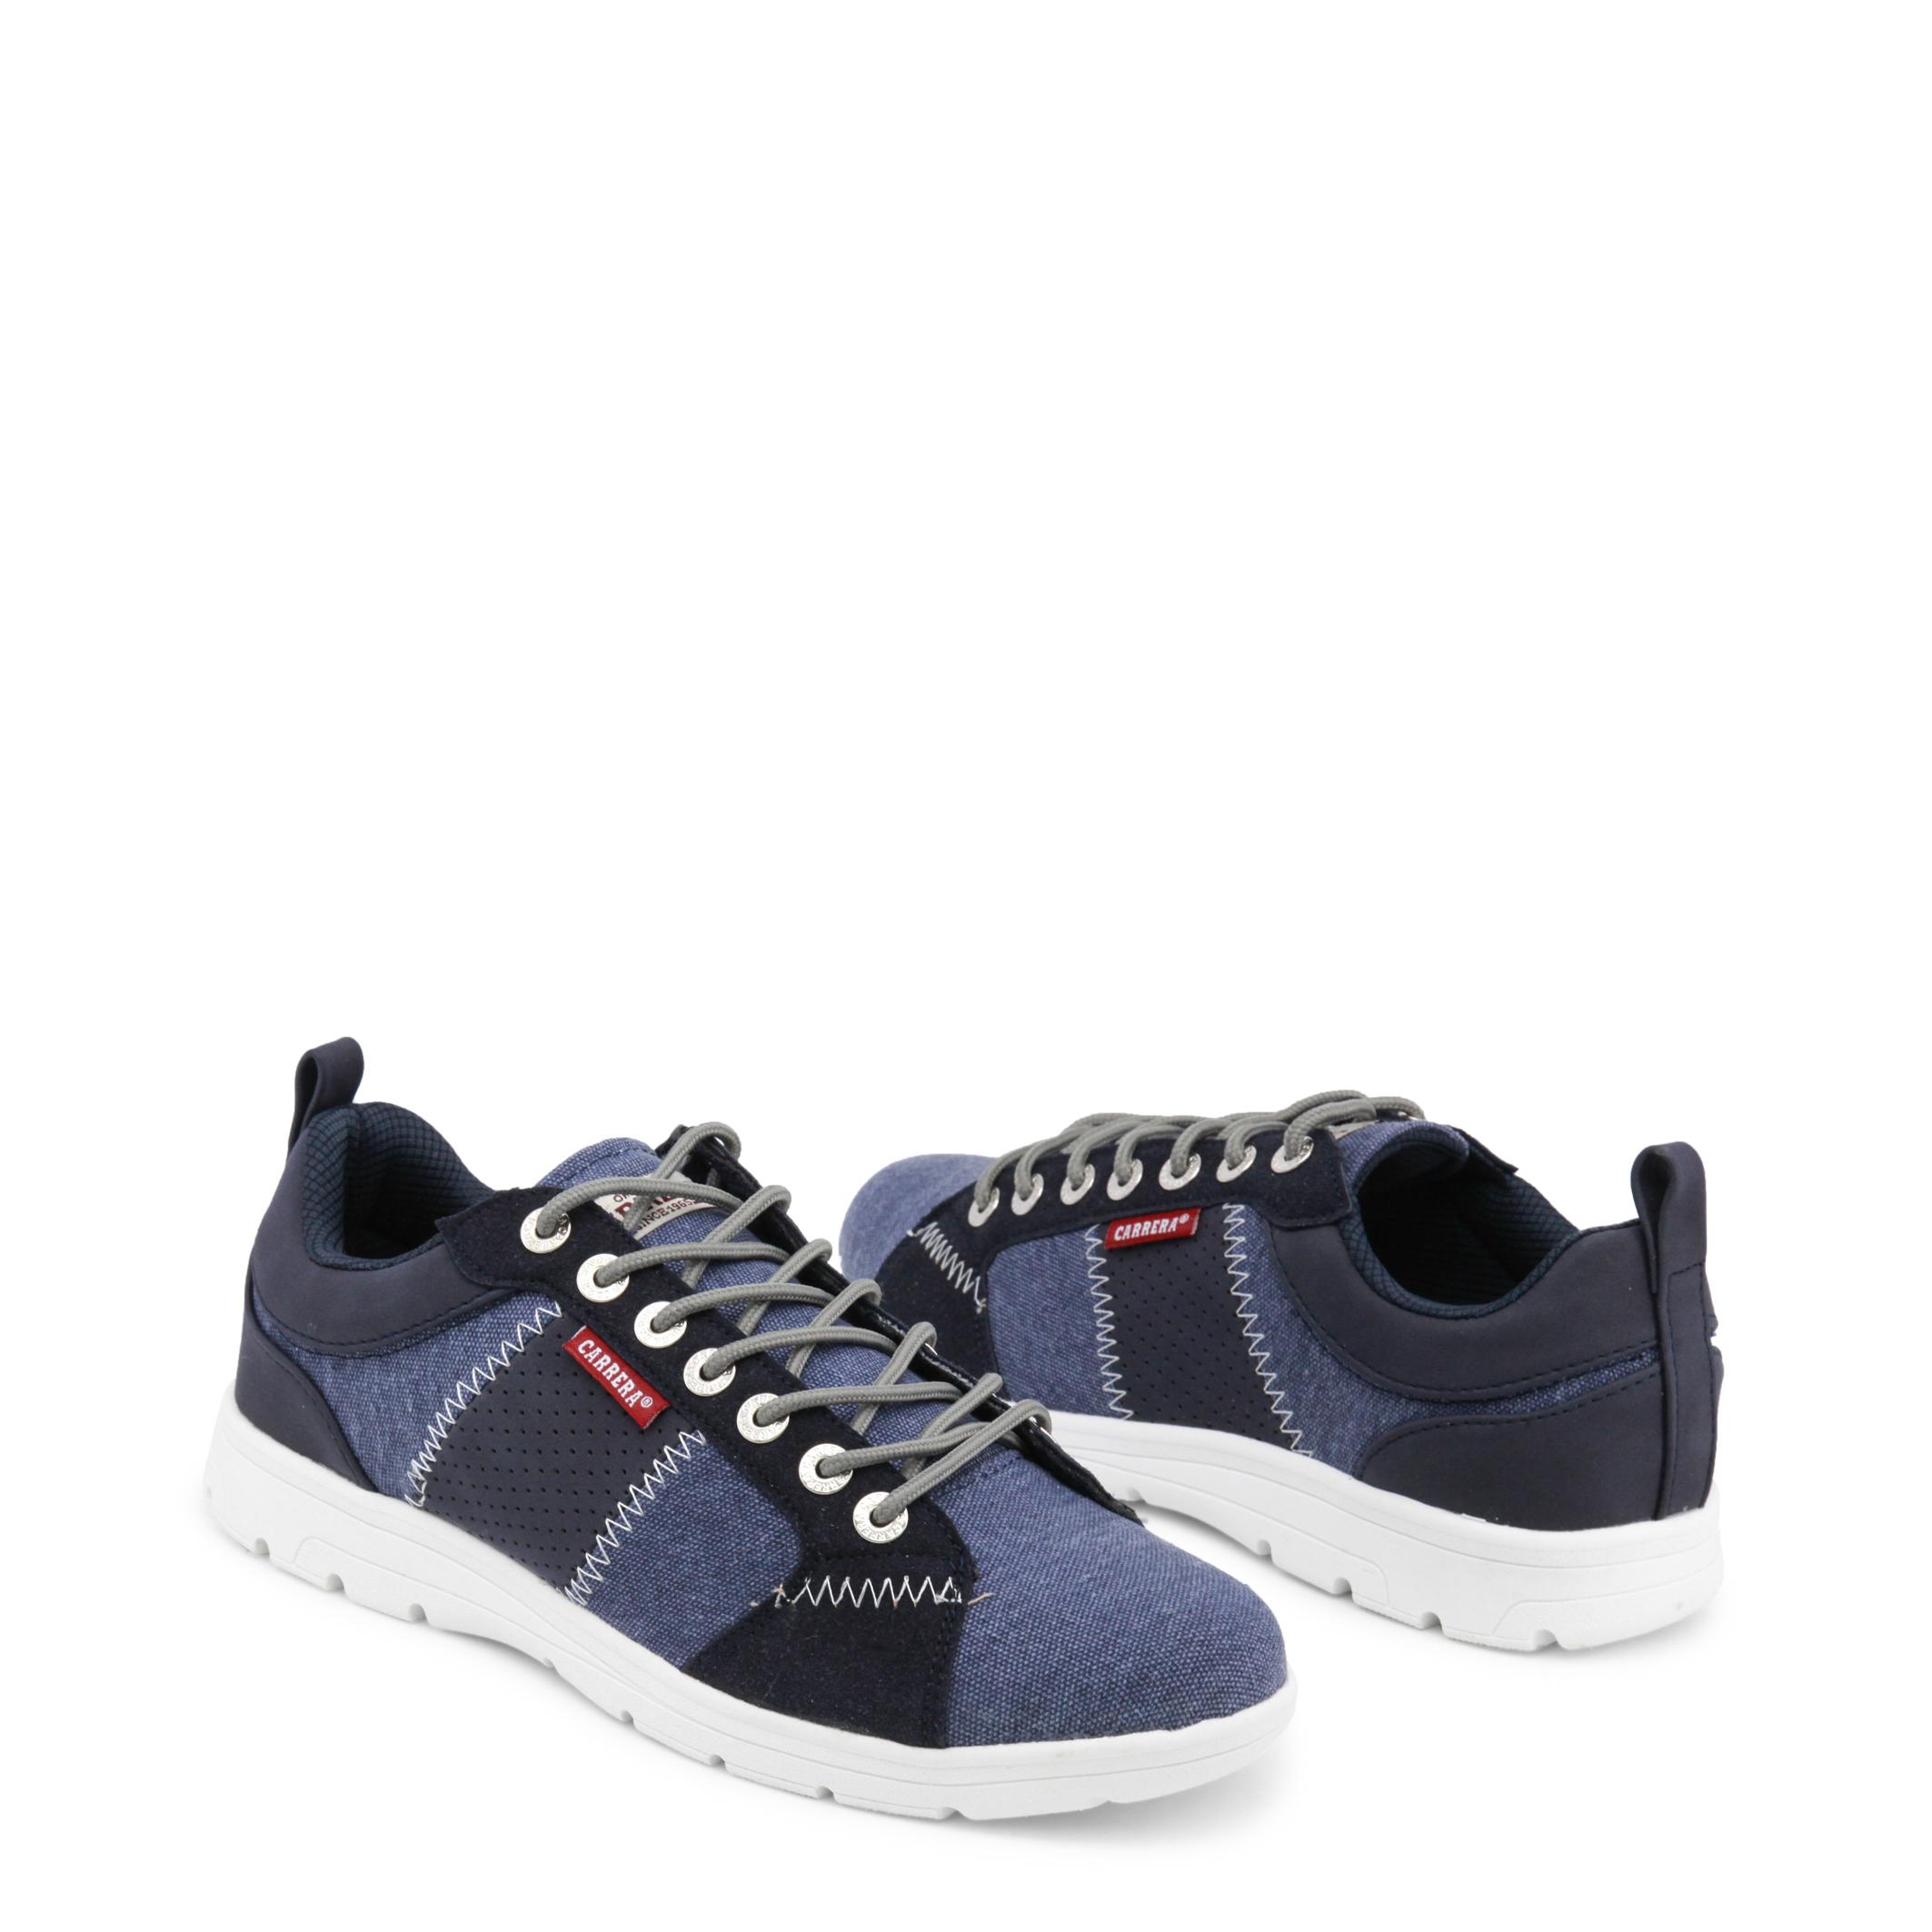 Carrera Jeans Schuhe CBM815060, Herren Sneakers Blau/Grau Frühling/Sommer turnsc